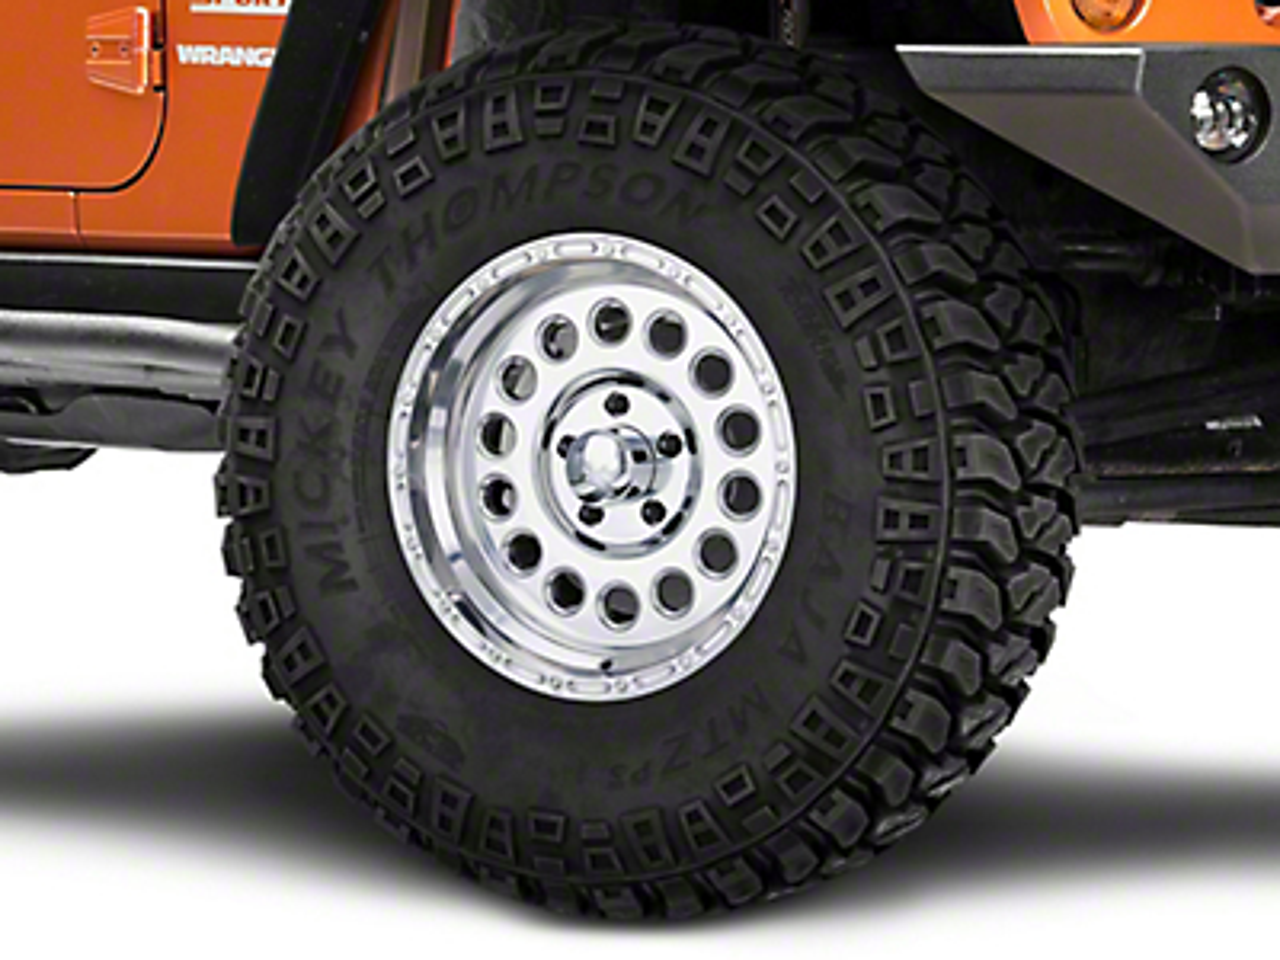 Raceline 887 Rockcrusher Polished Wheel - 17x9 (07-18 Jeep Wrangler JK; 2018 Jeep Wrangler JL)